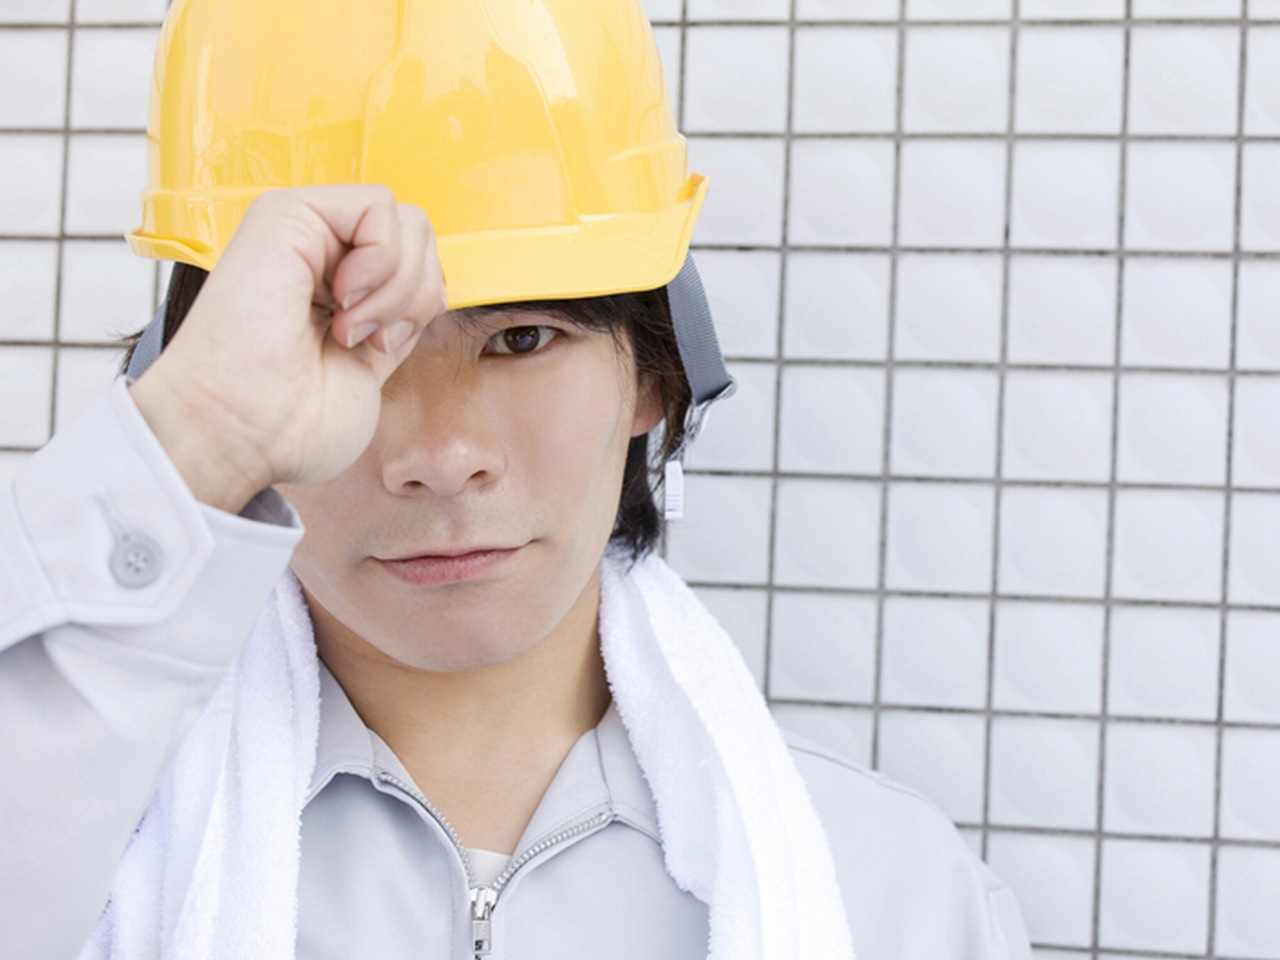 【日払い・週払い】(1)鳶職 [ア][正] (2)建築・建設・土木...